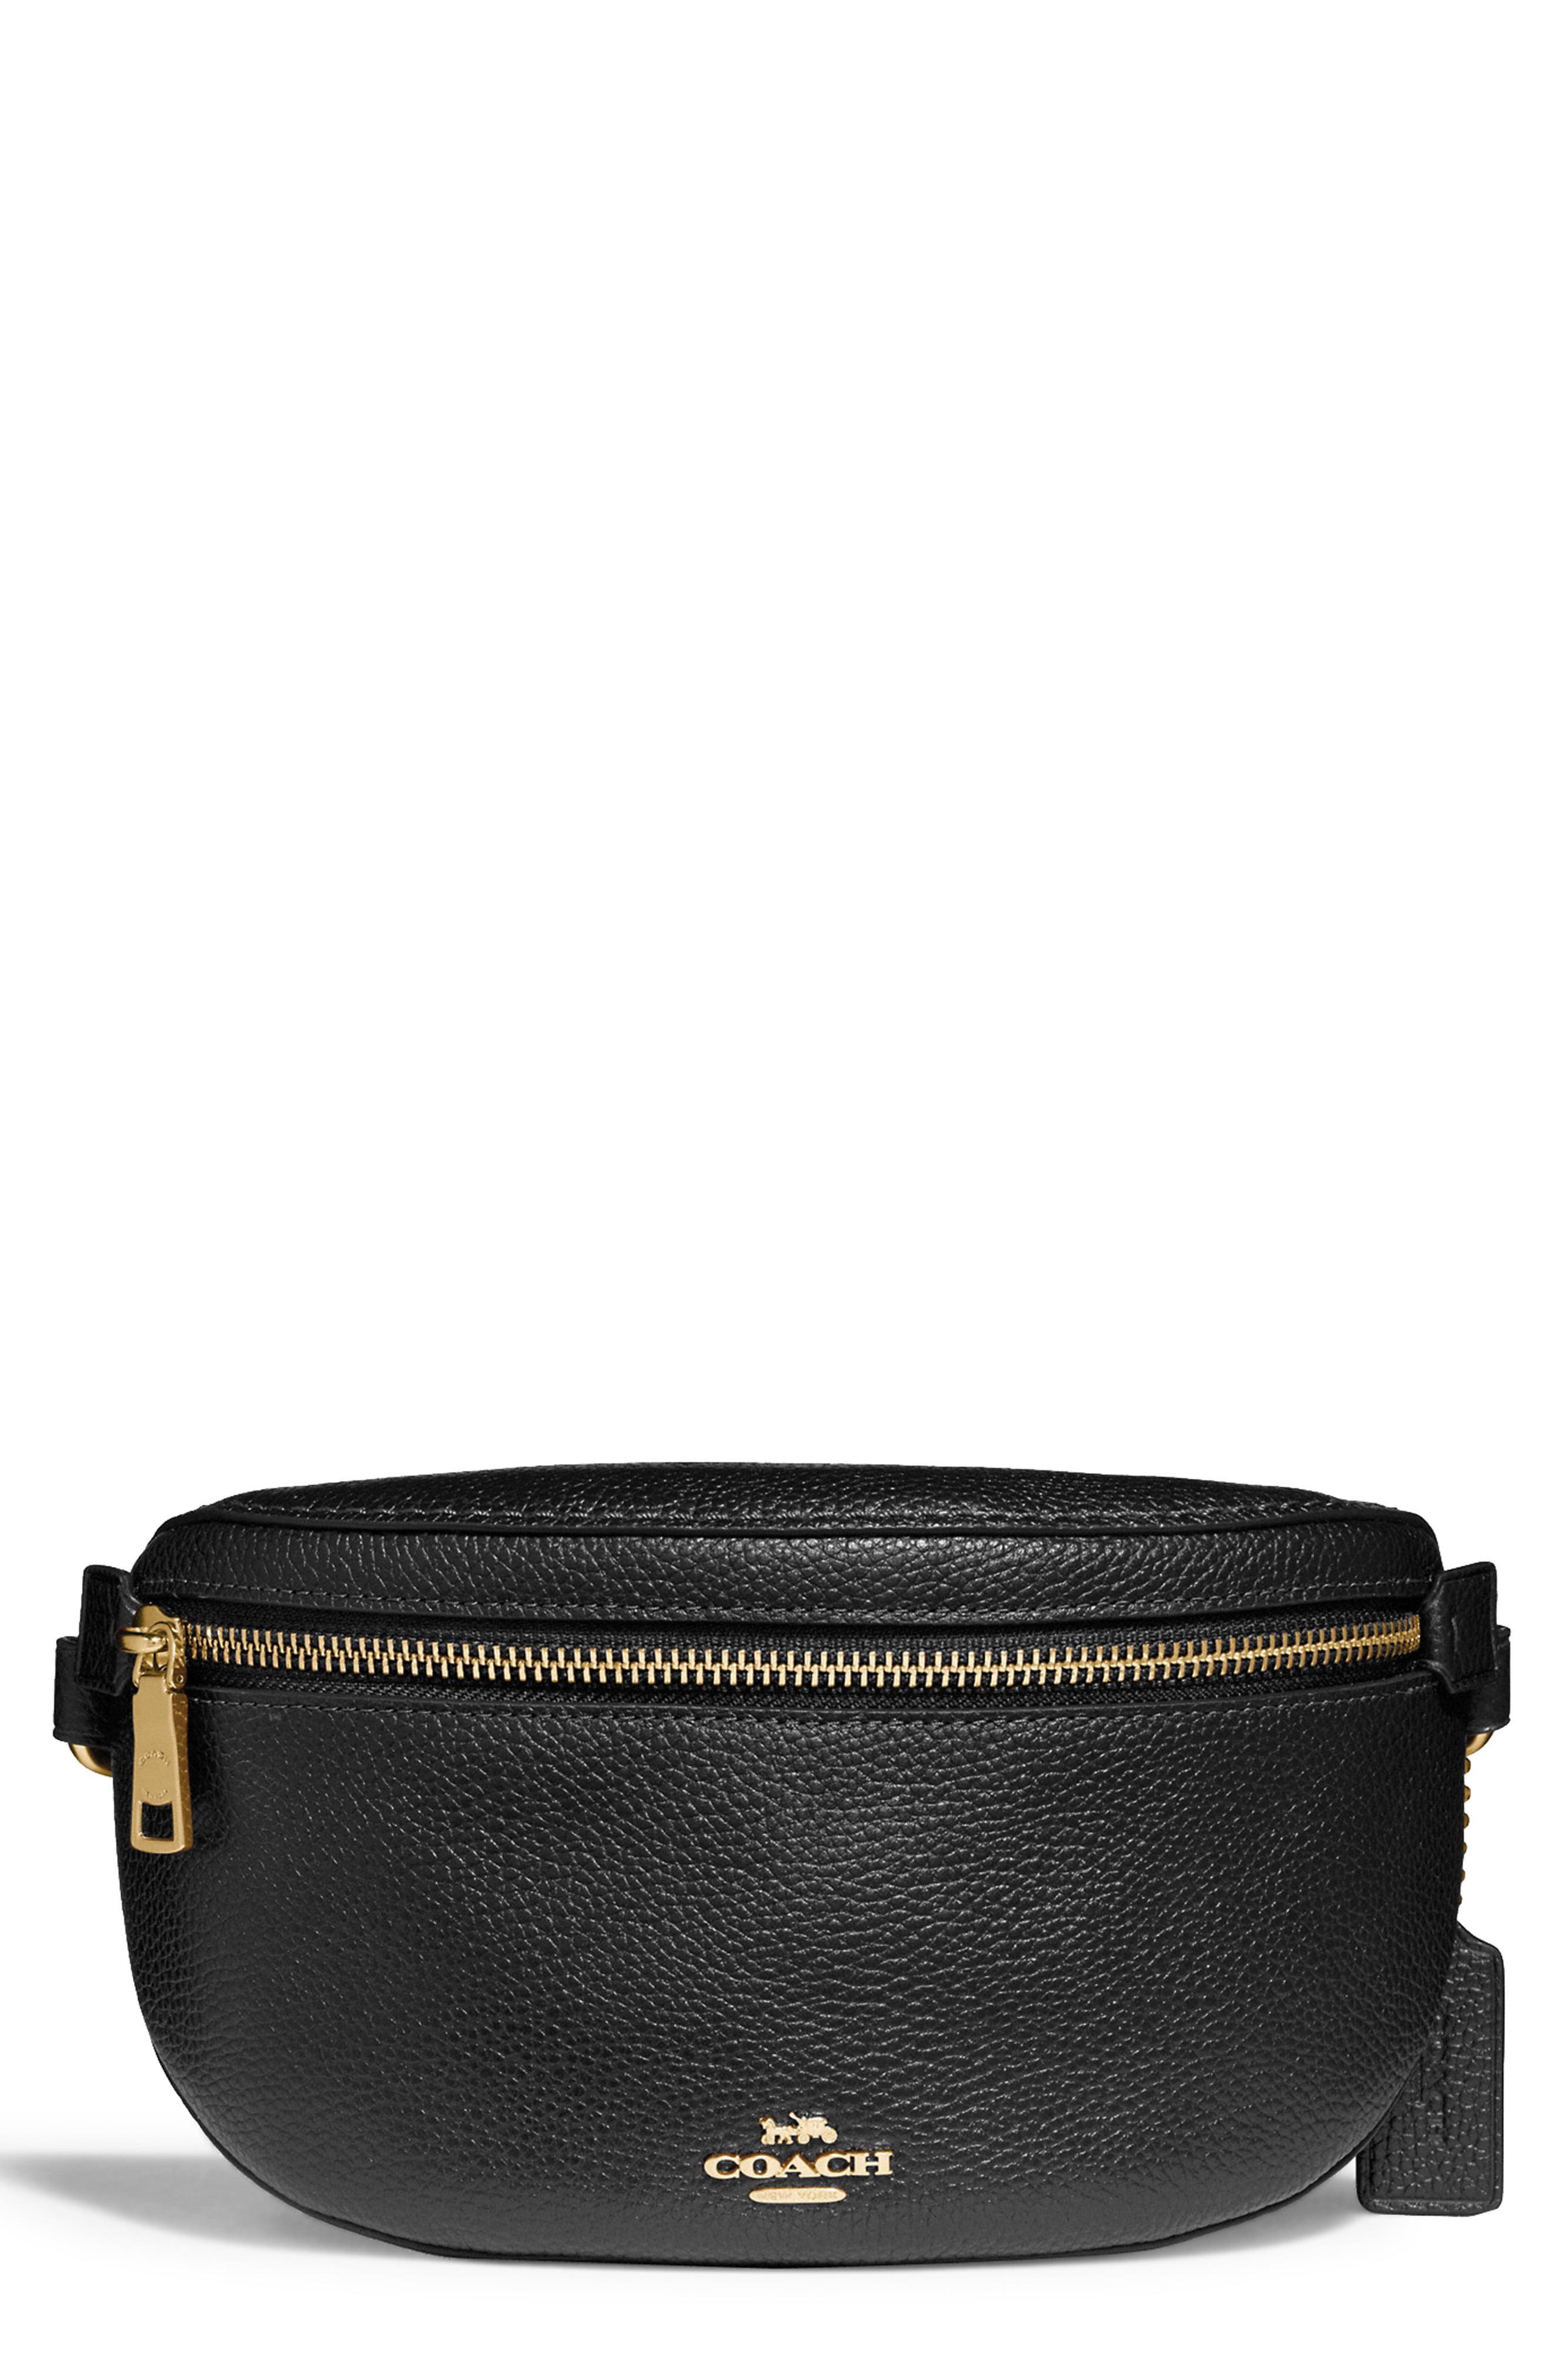 592703f24135a COACH - Black Belt Bag - Lyst. View fullscreen